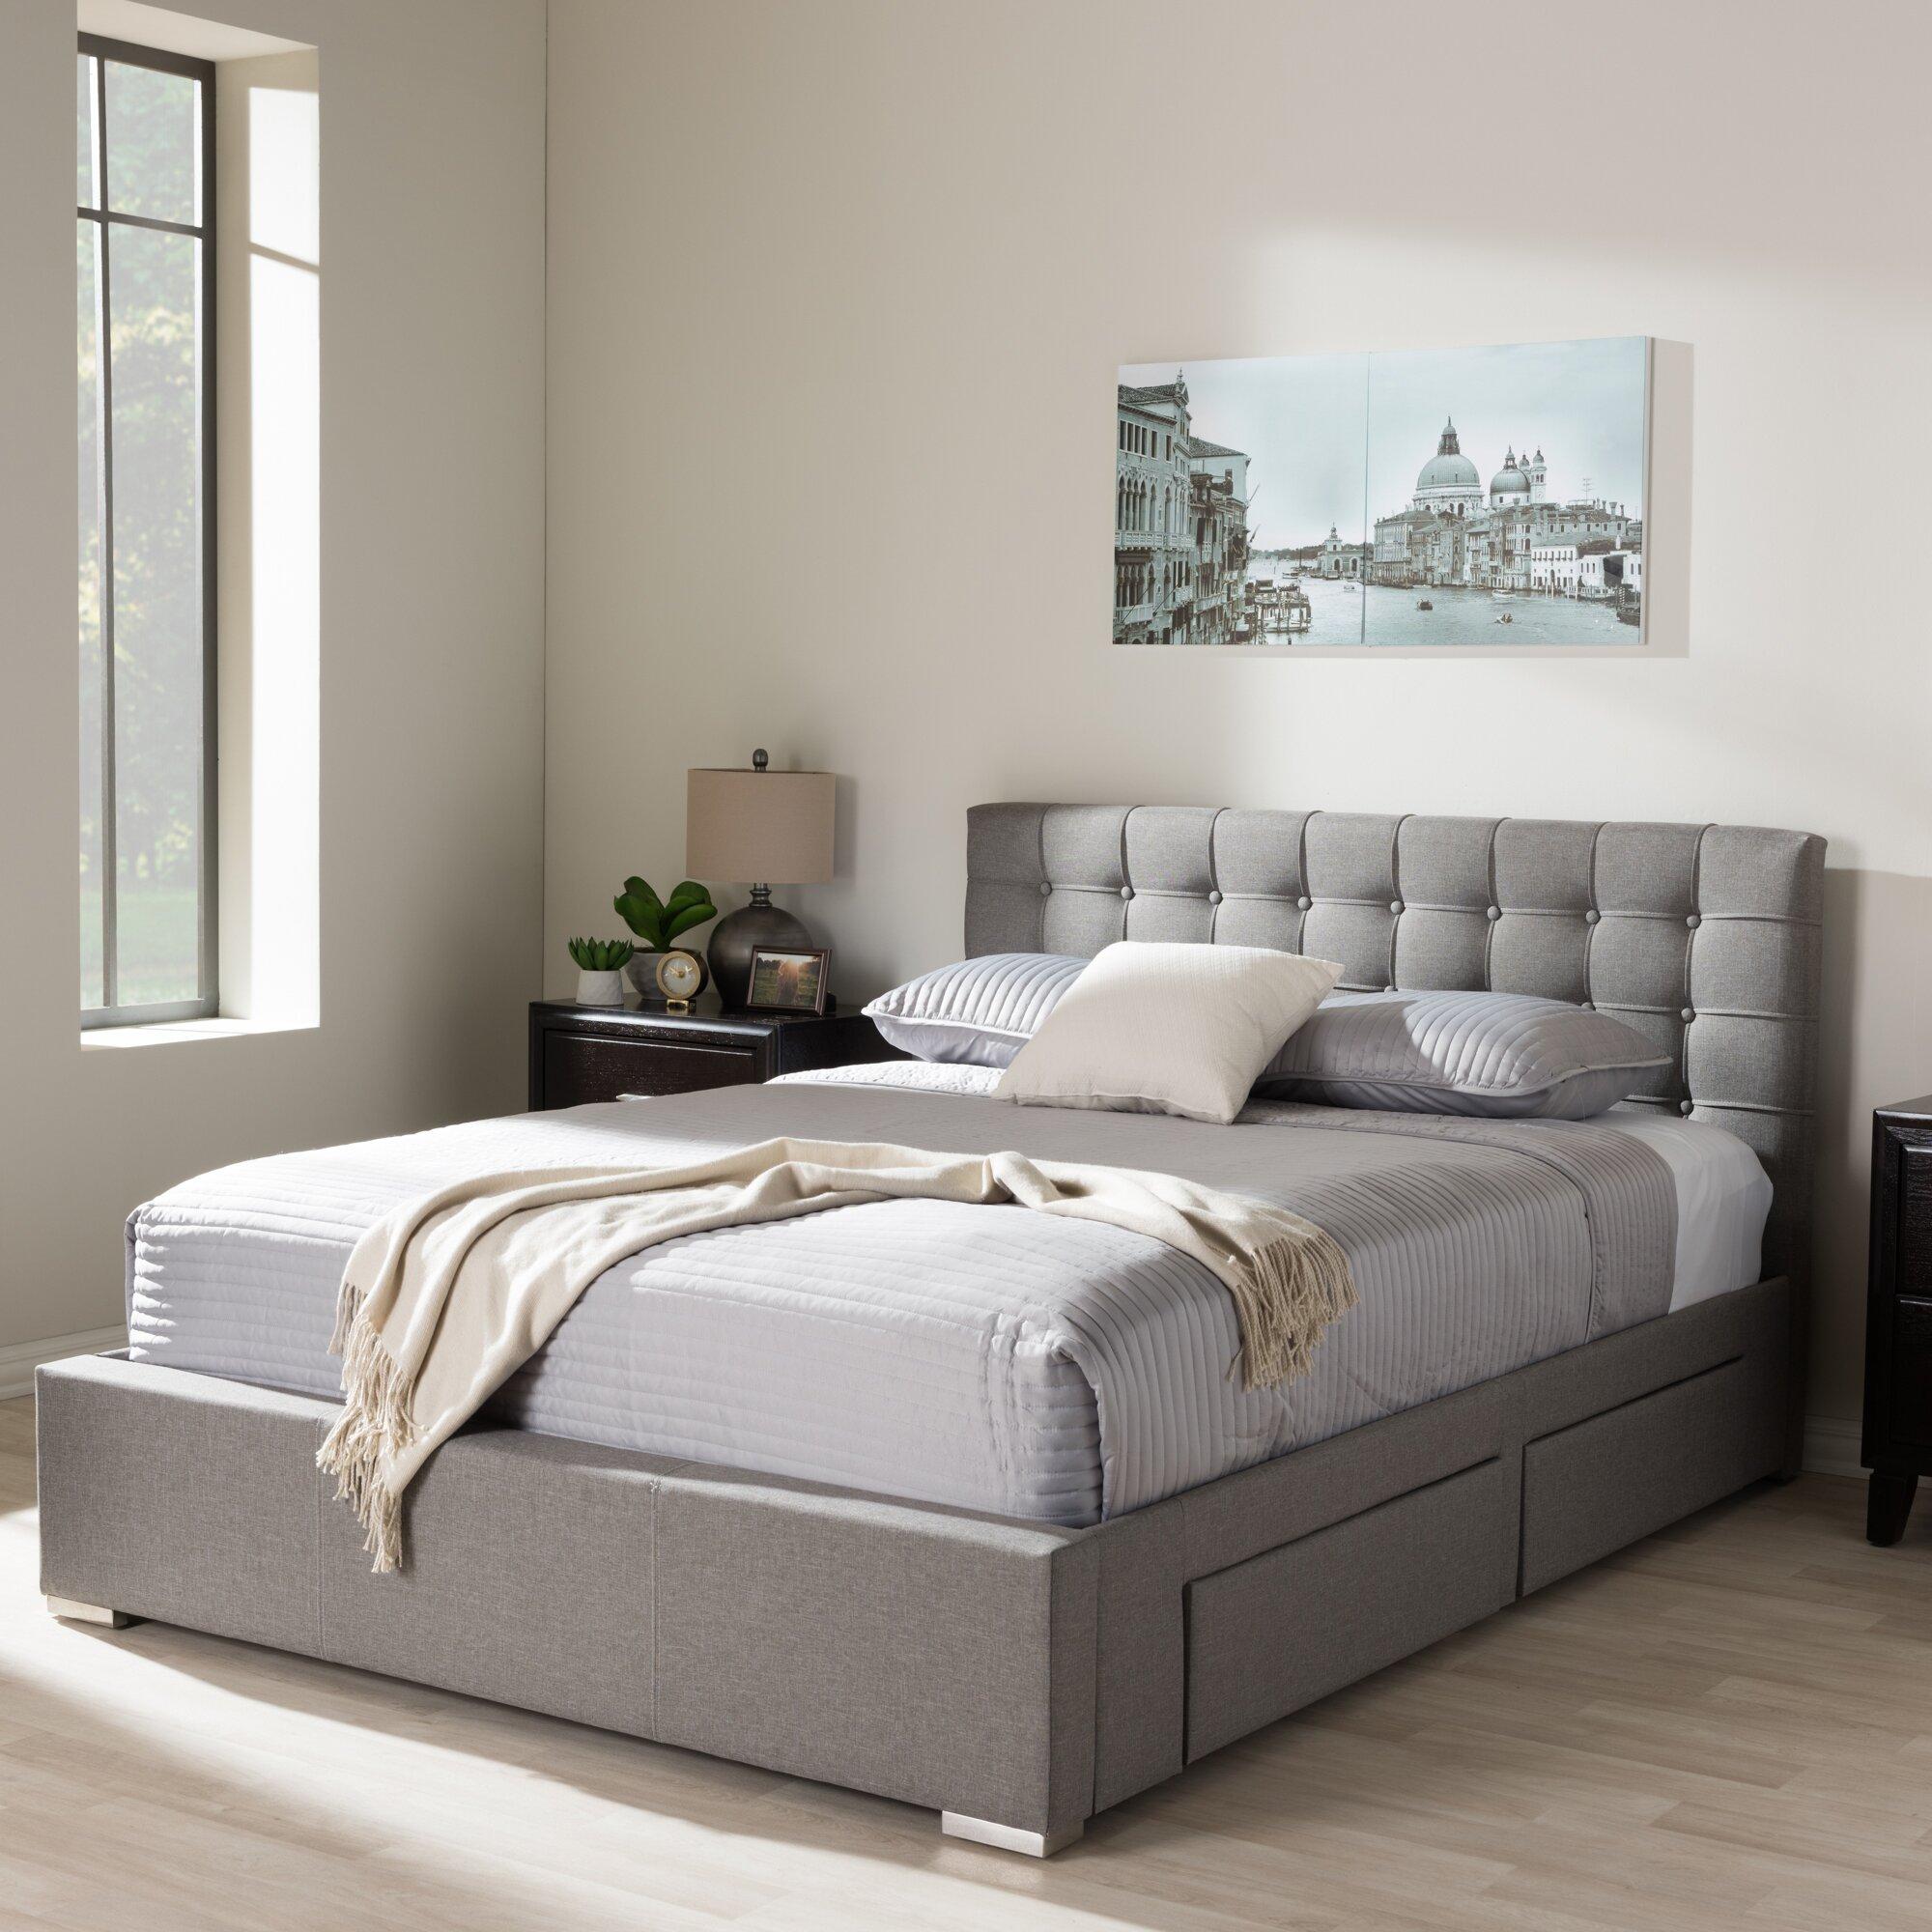 Upholstered platform bed with storage - Latitude Run Myrrine Upholstered Storage Platform Bed Reviews